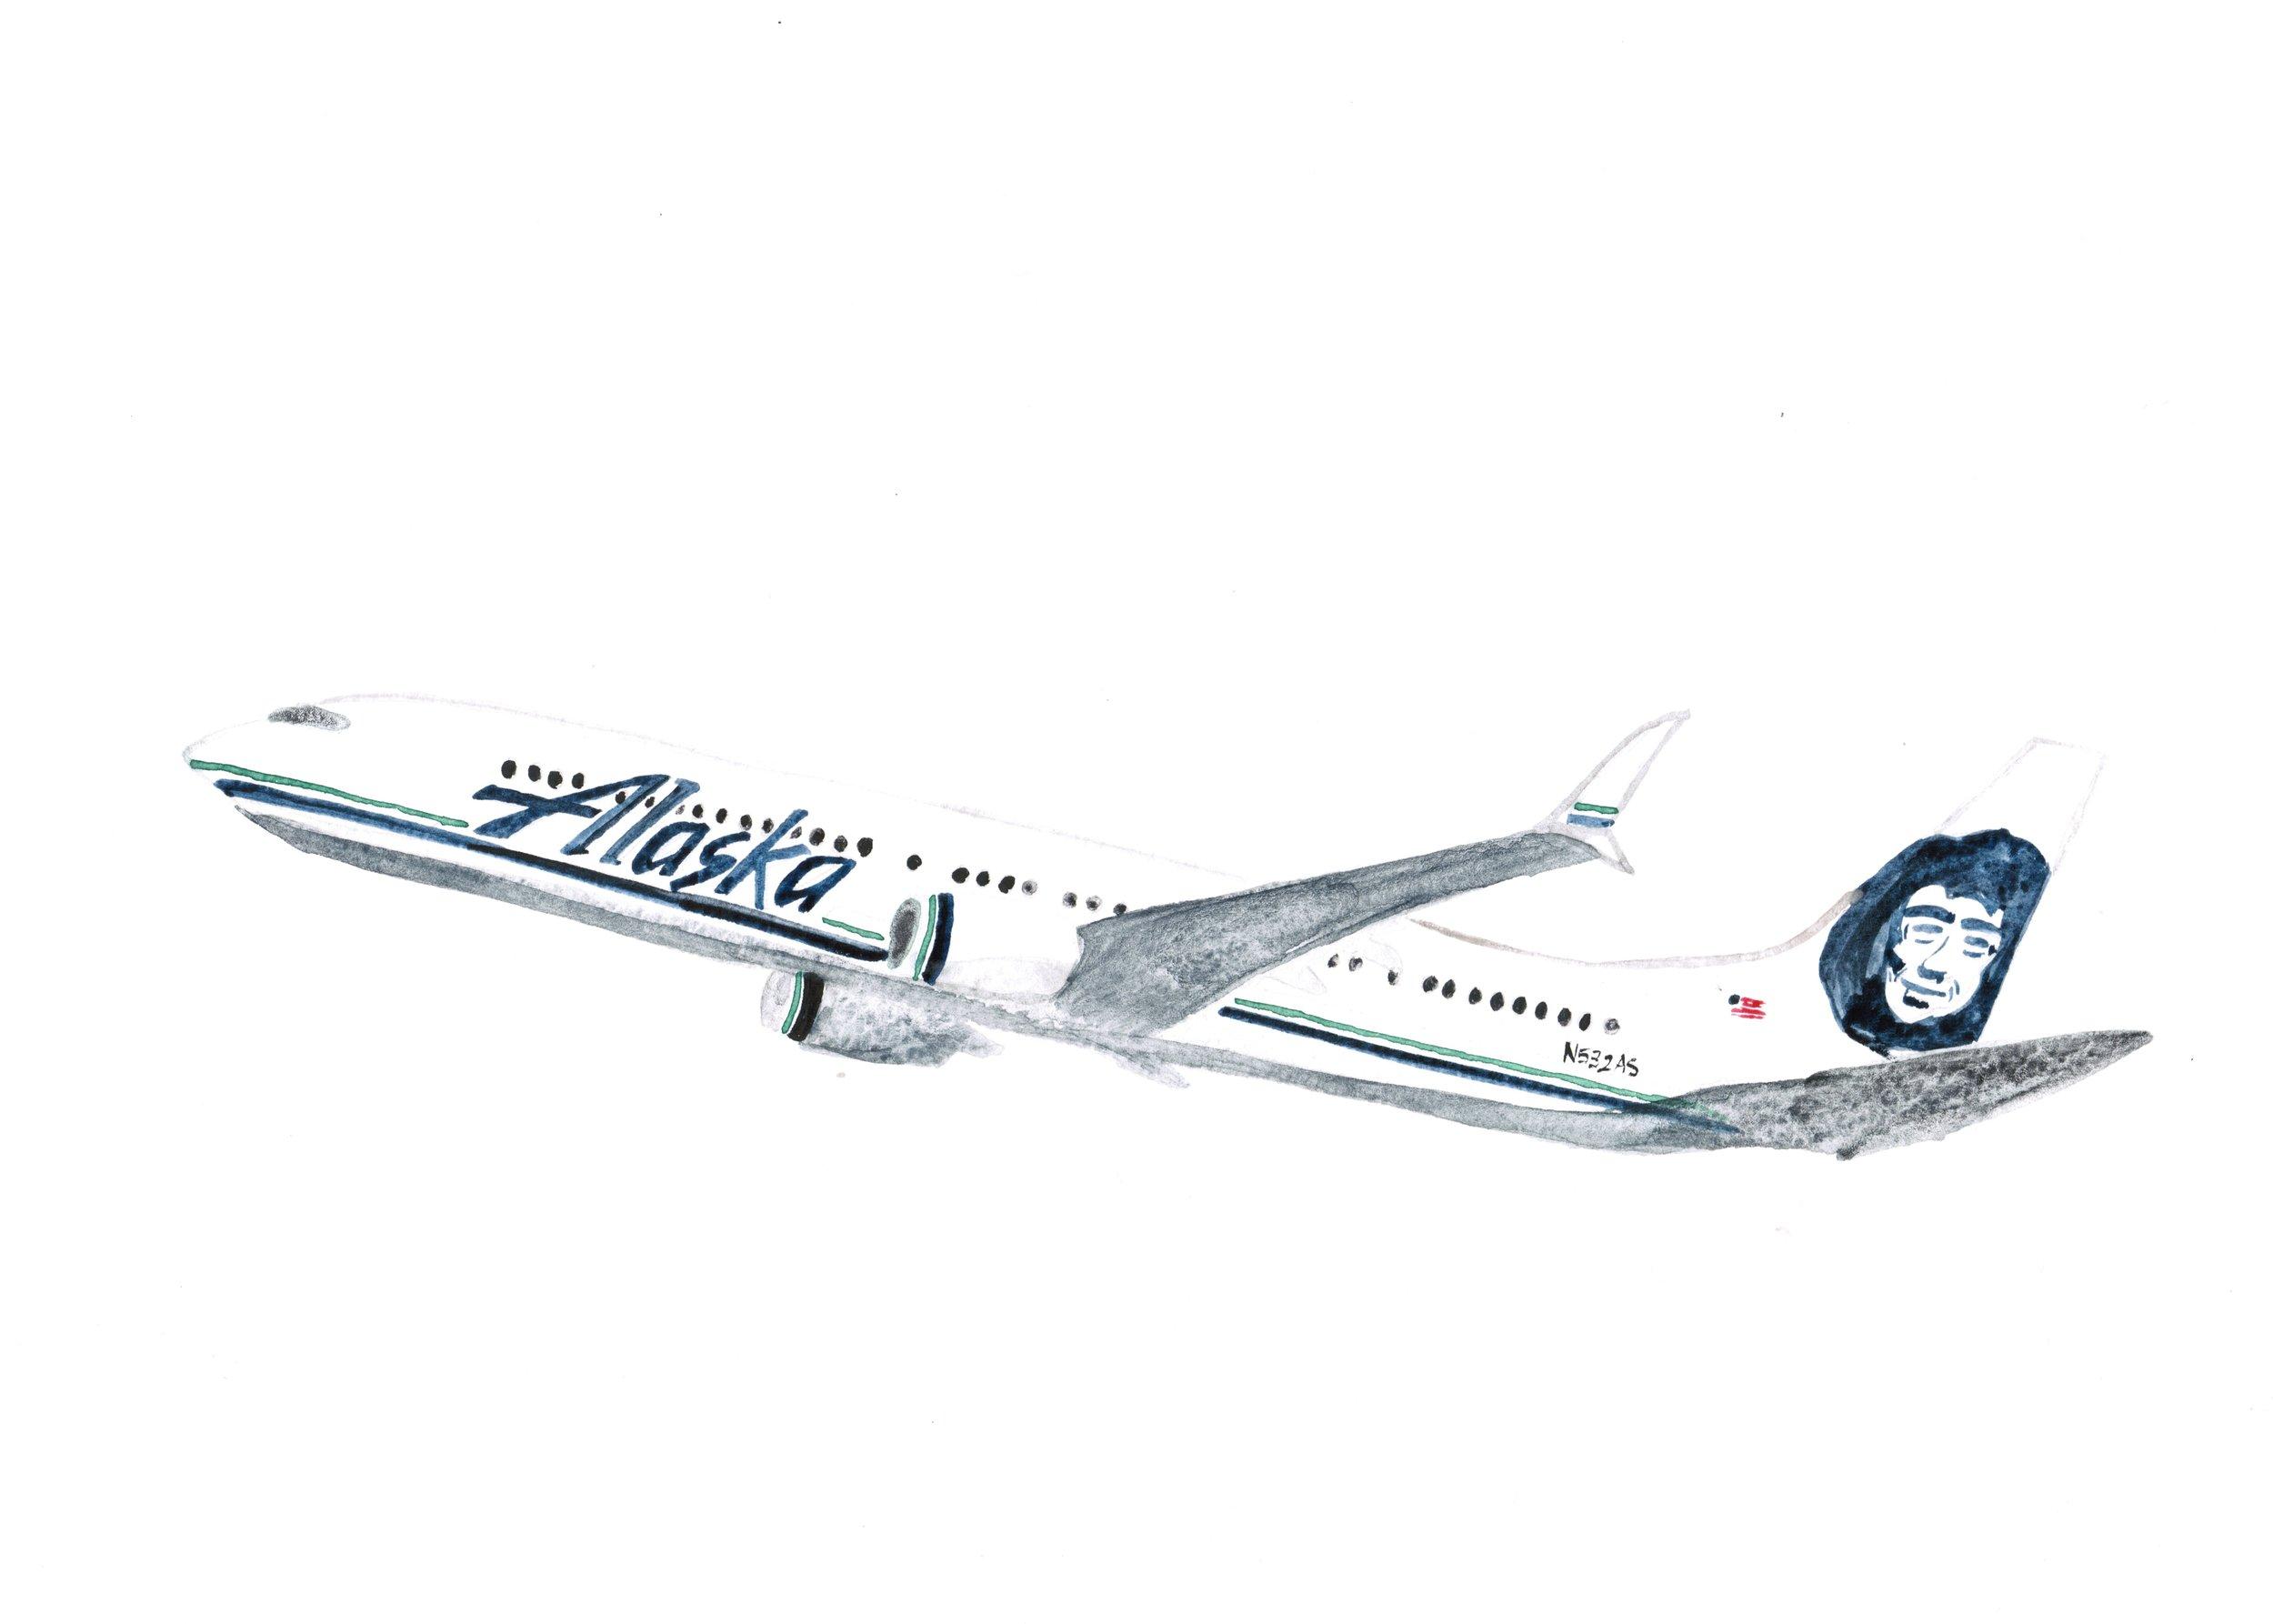 Alaska Airlines Drawing.jpeg